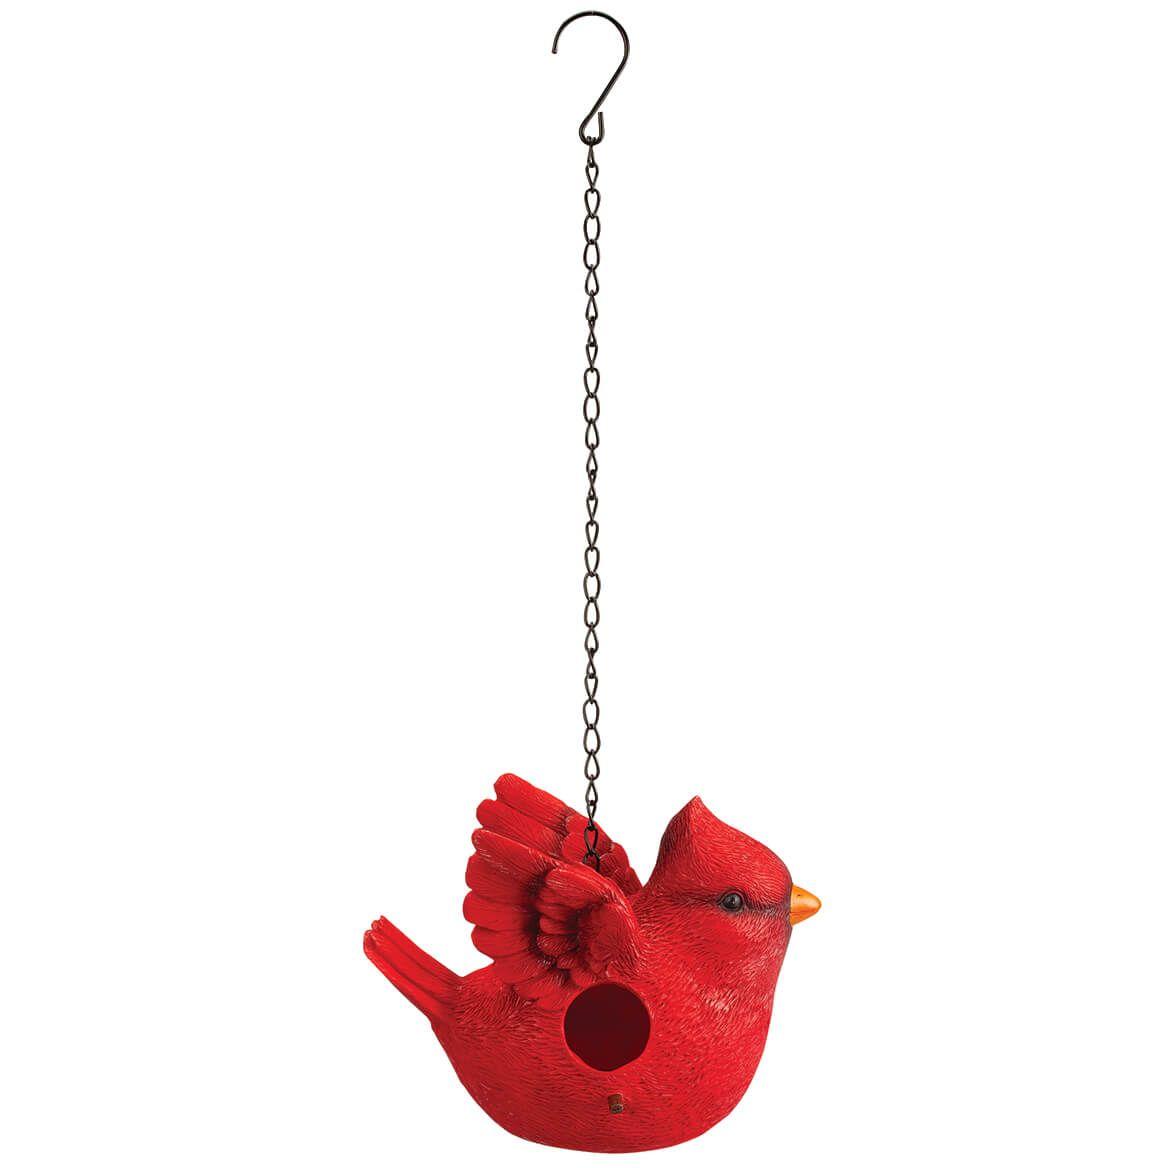 Resin Cardinal Shaped Birdhouse-372286